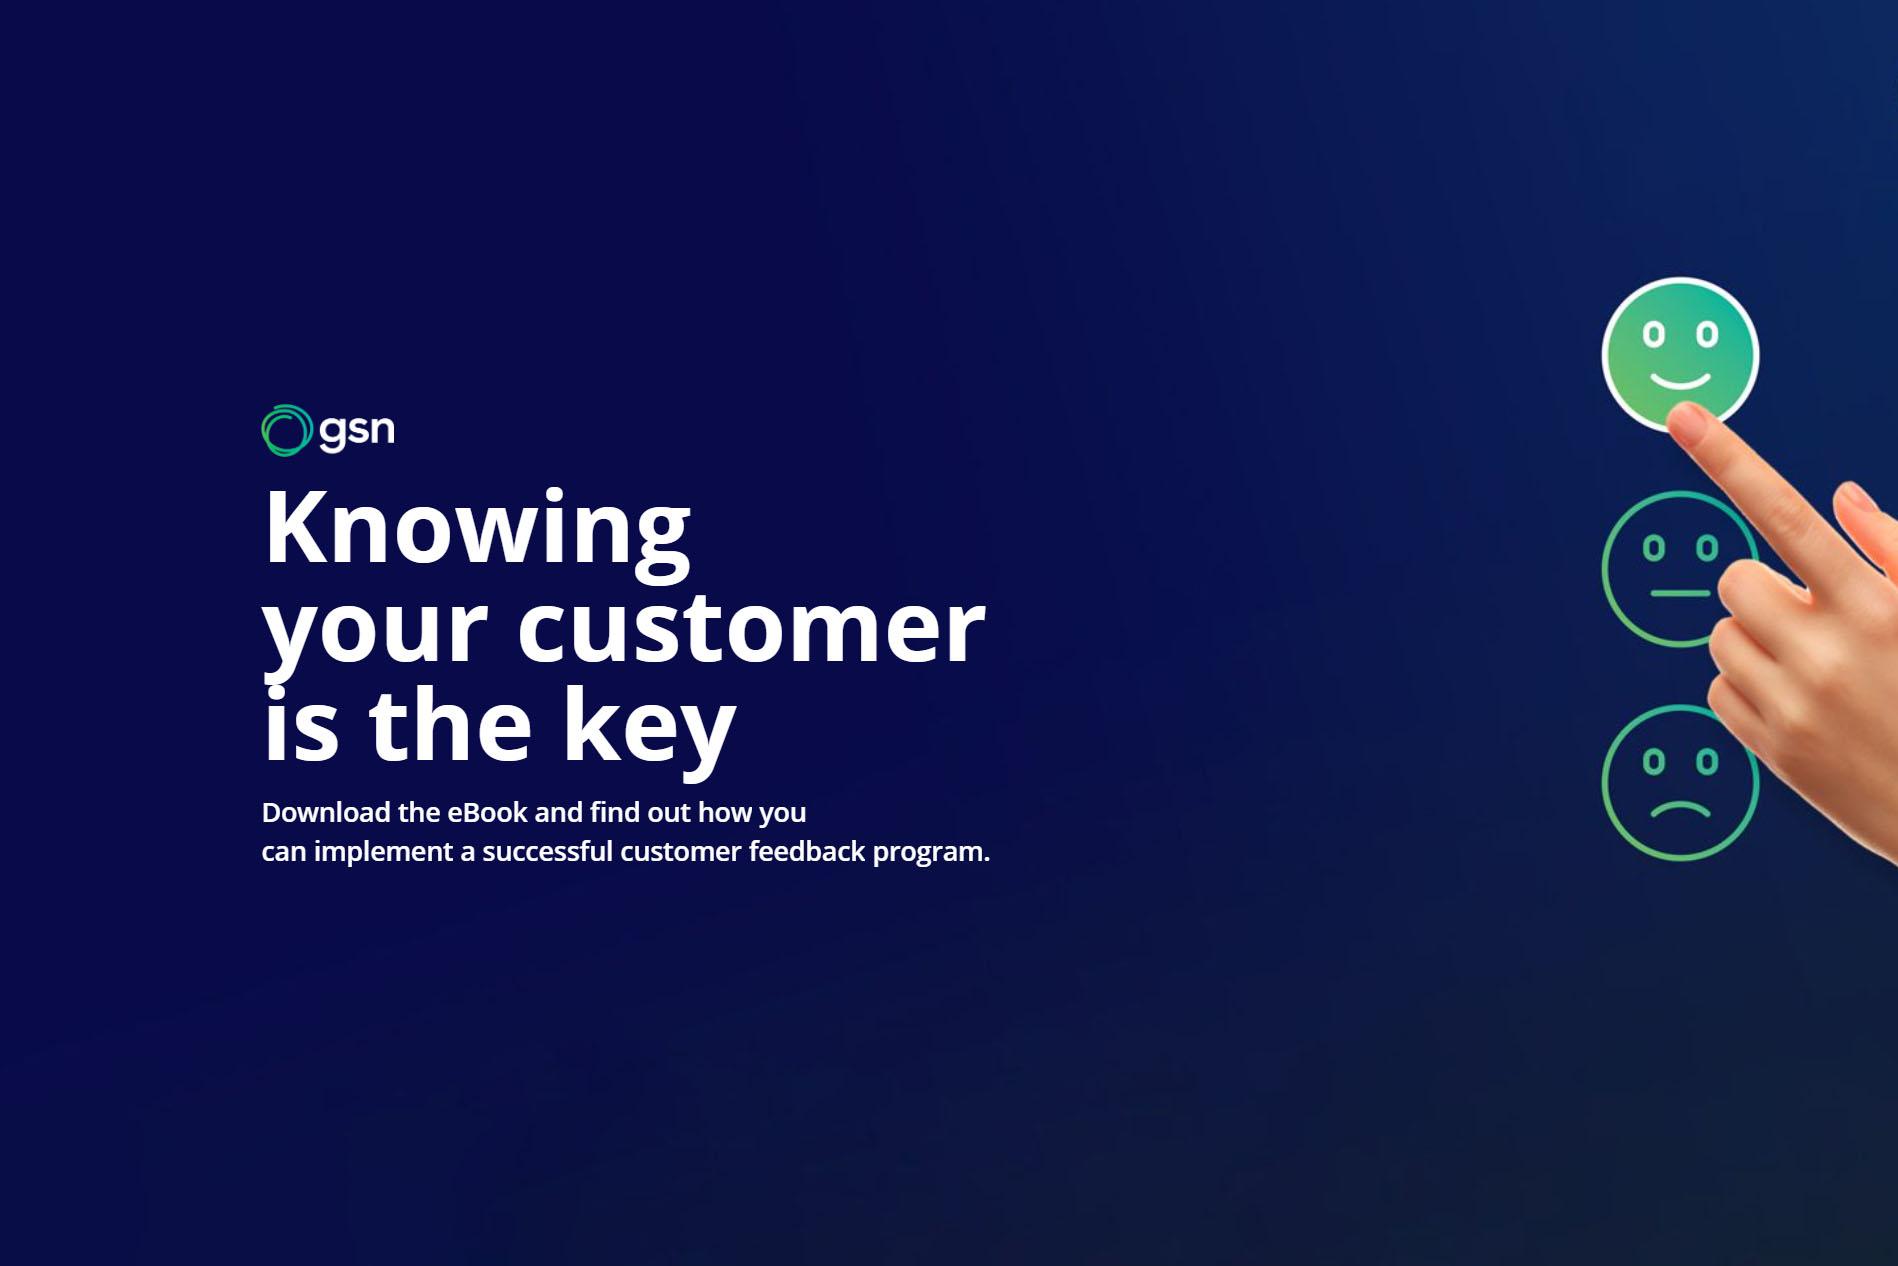 Implementing a successful customer feedback program